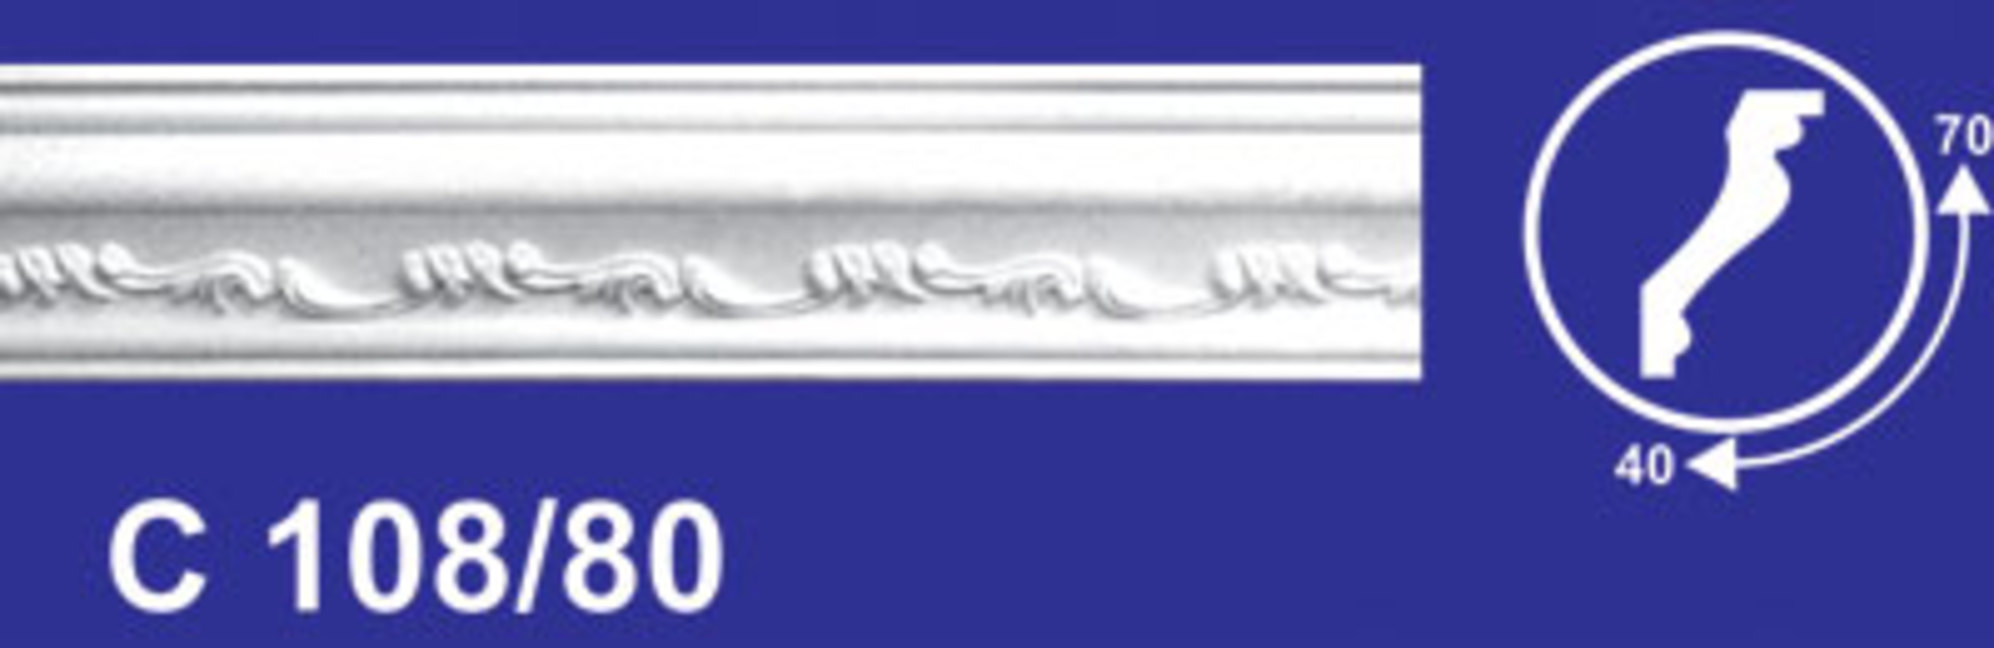 108/80 /40*70*2000/Плинтус потолочный 1/35 Wikibau